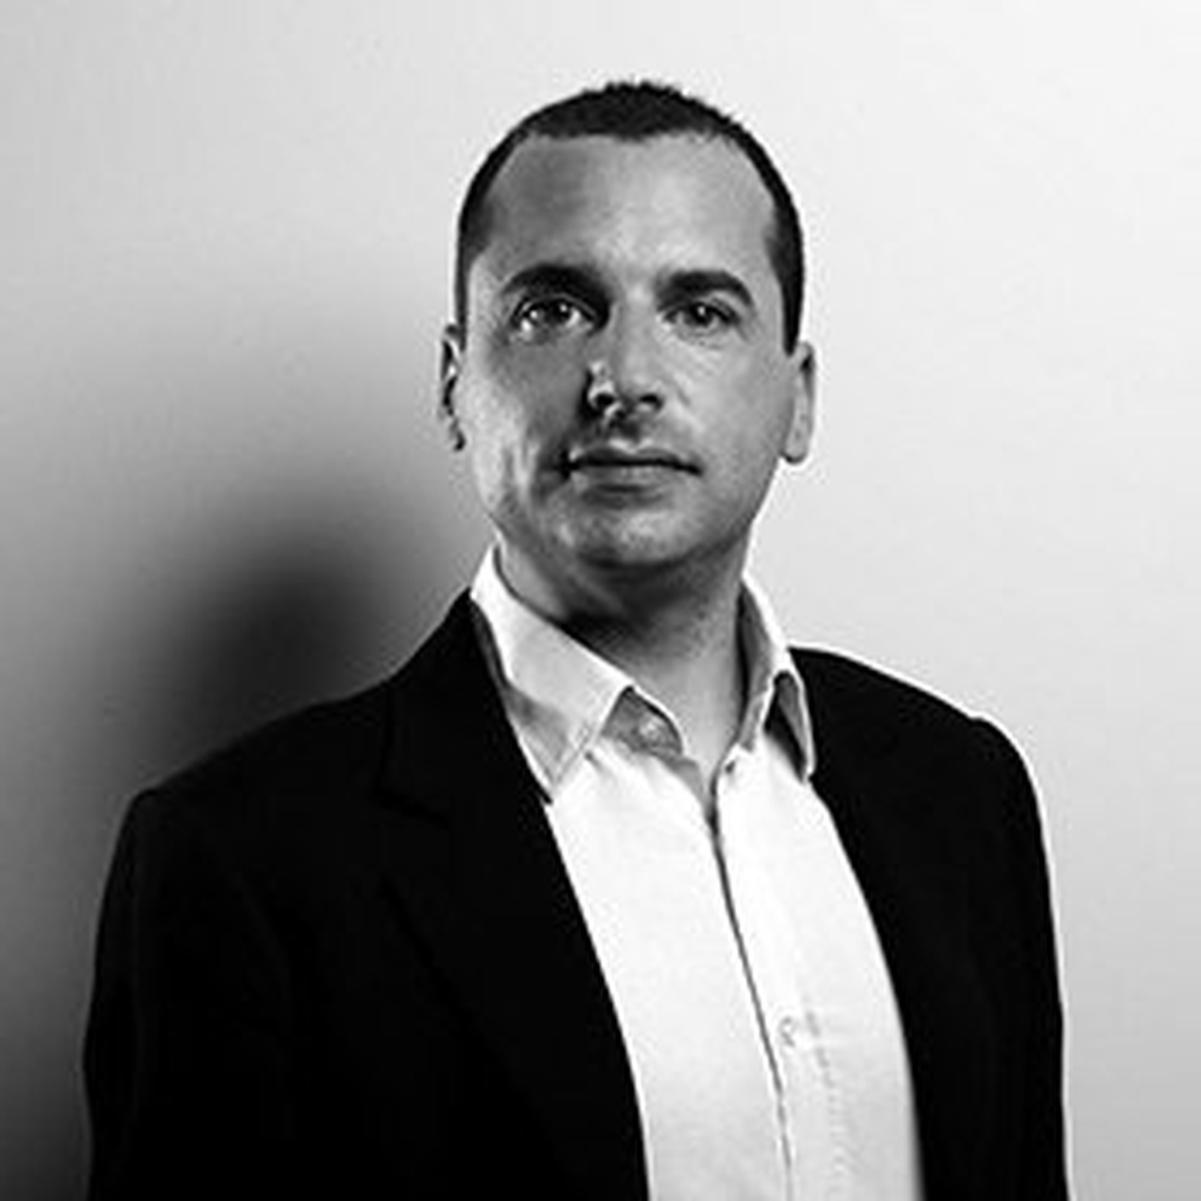 David Scholberg